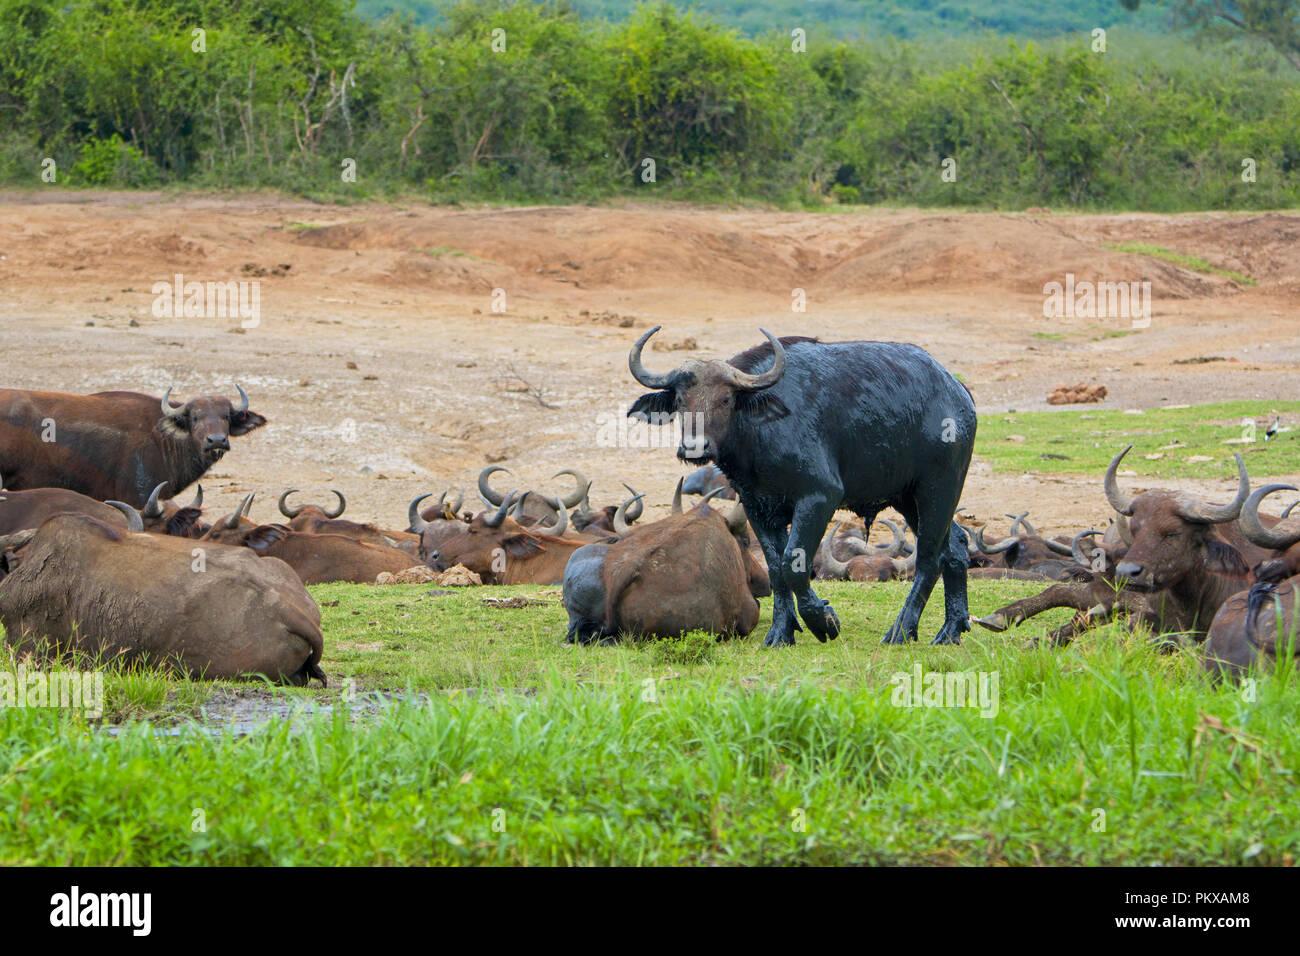 Bufale, Buffalo coperti di fango umido, Canale Kazinga, Uganda, Africa orientale Immagini Stock